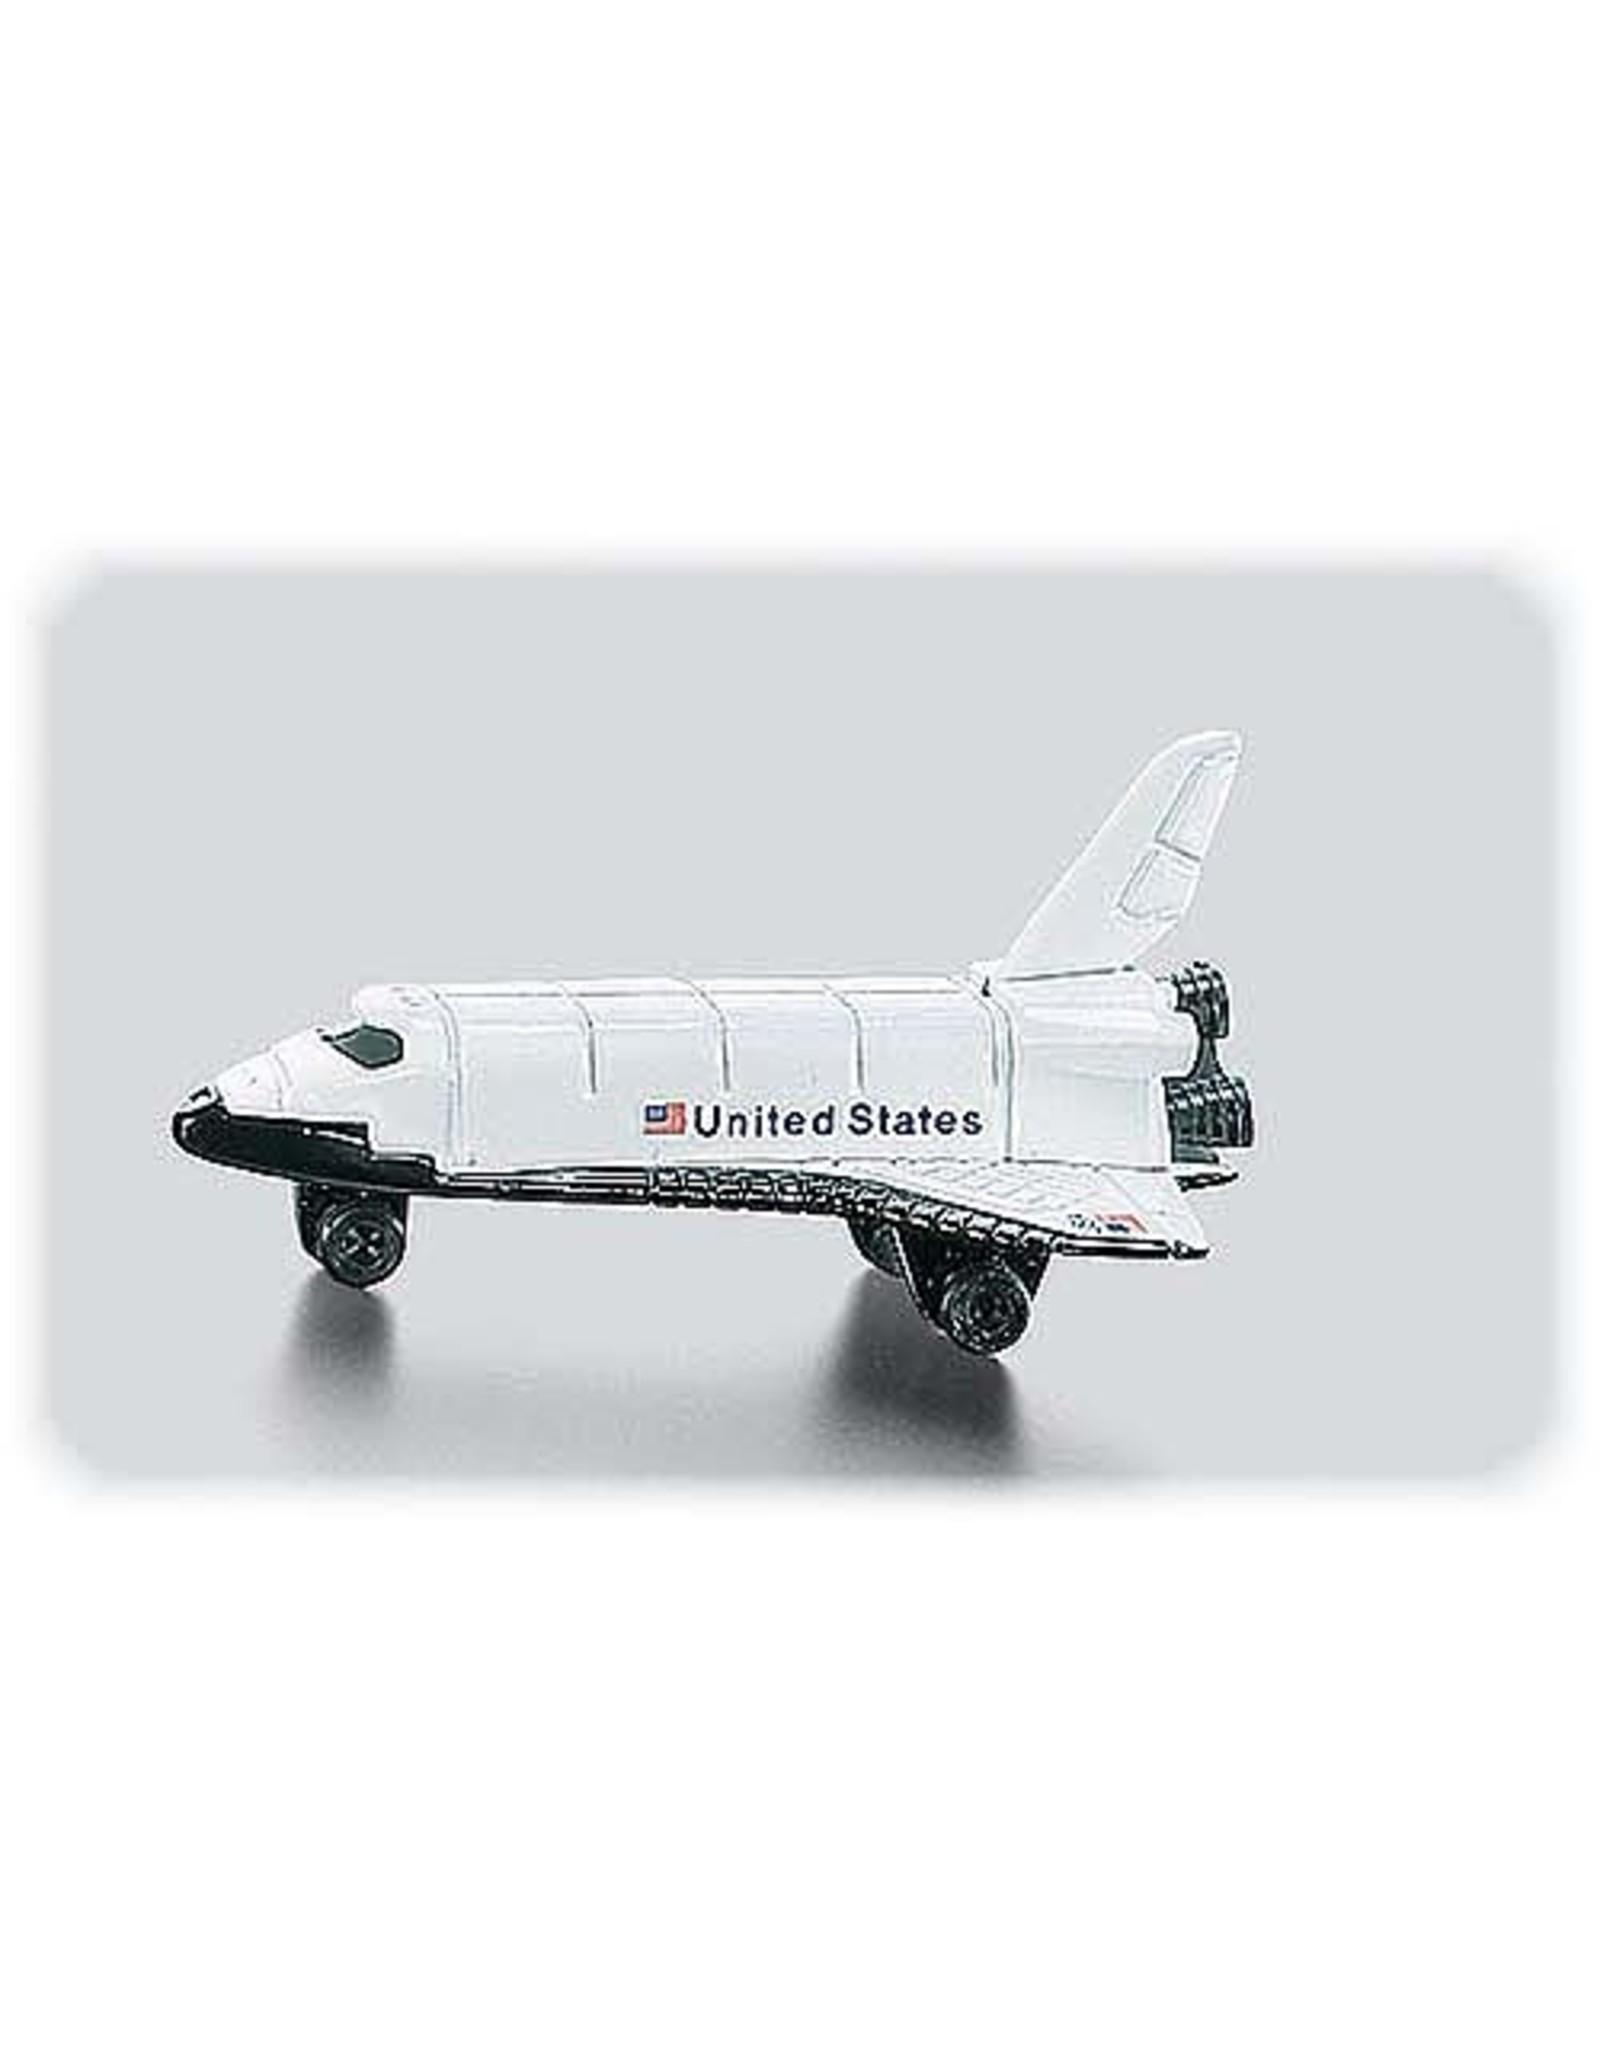 Siku Siku 0817 - Space Shuttle